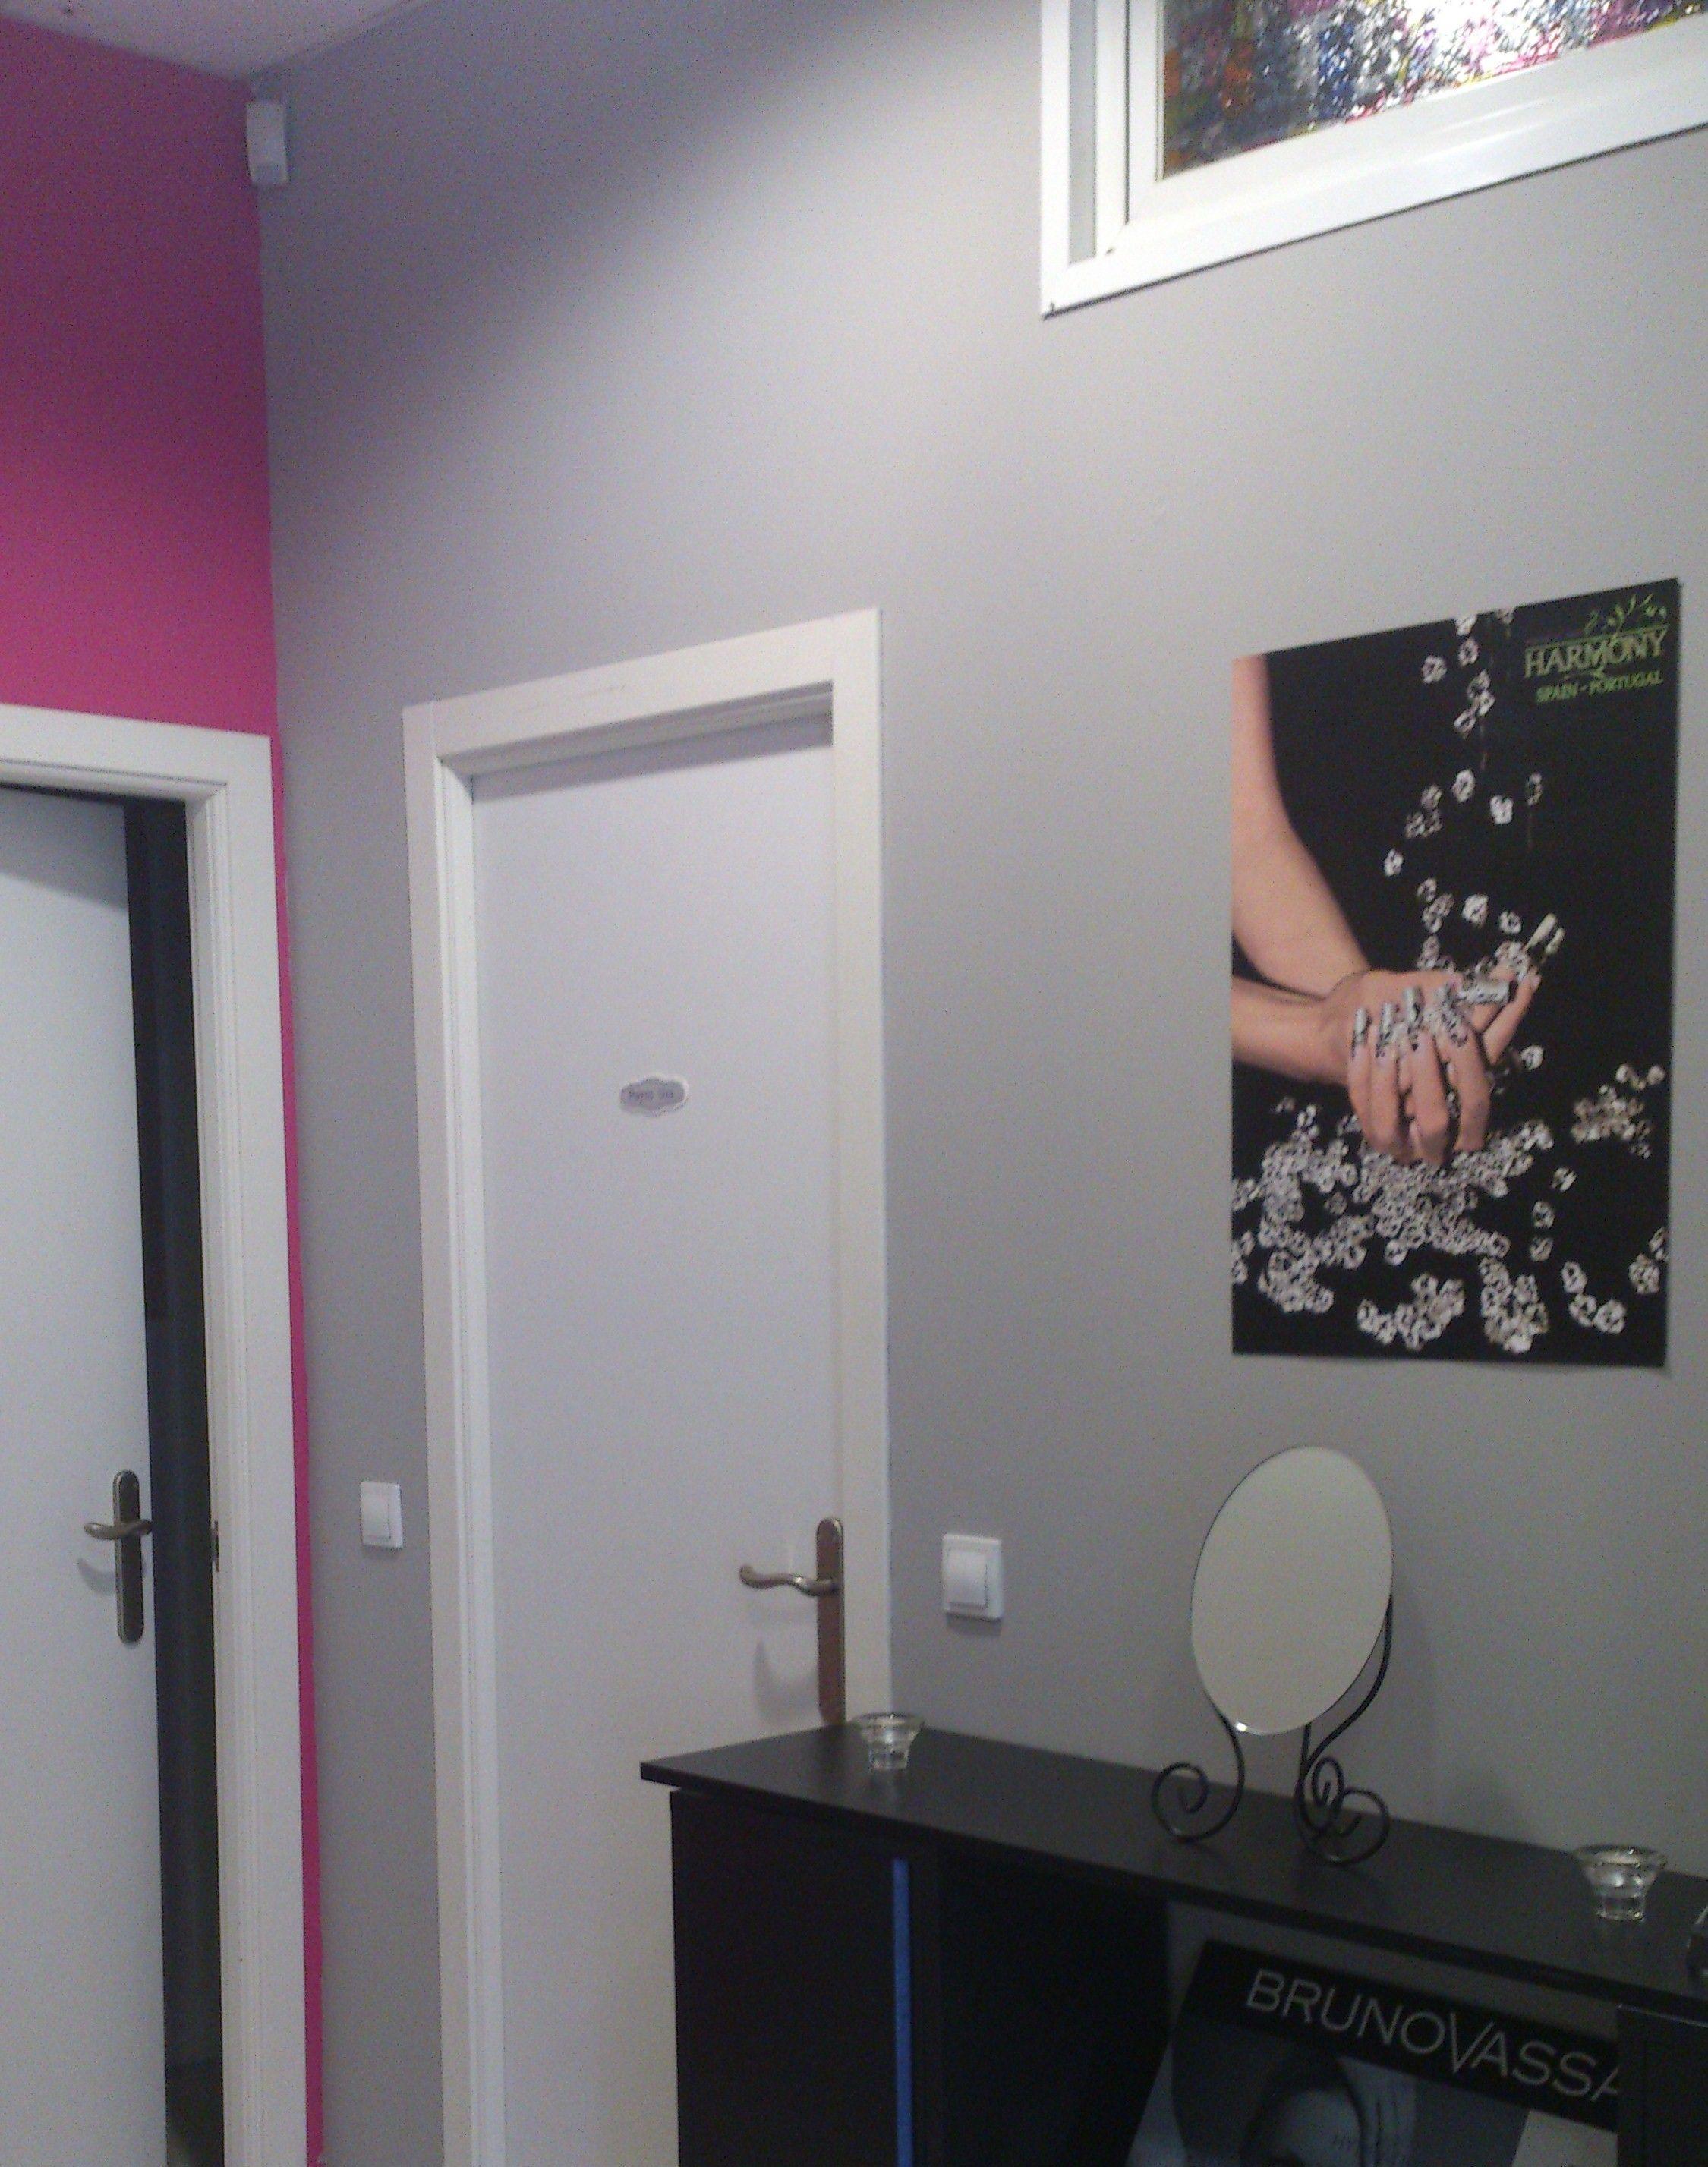 Centro de estética integral en Móstoles para cuidar de tu belleza